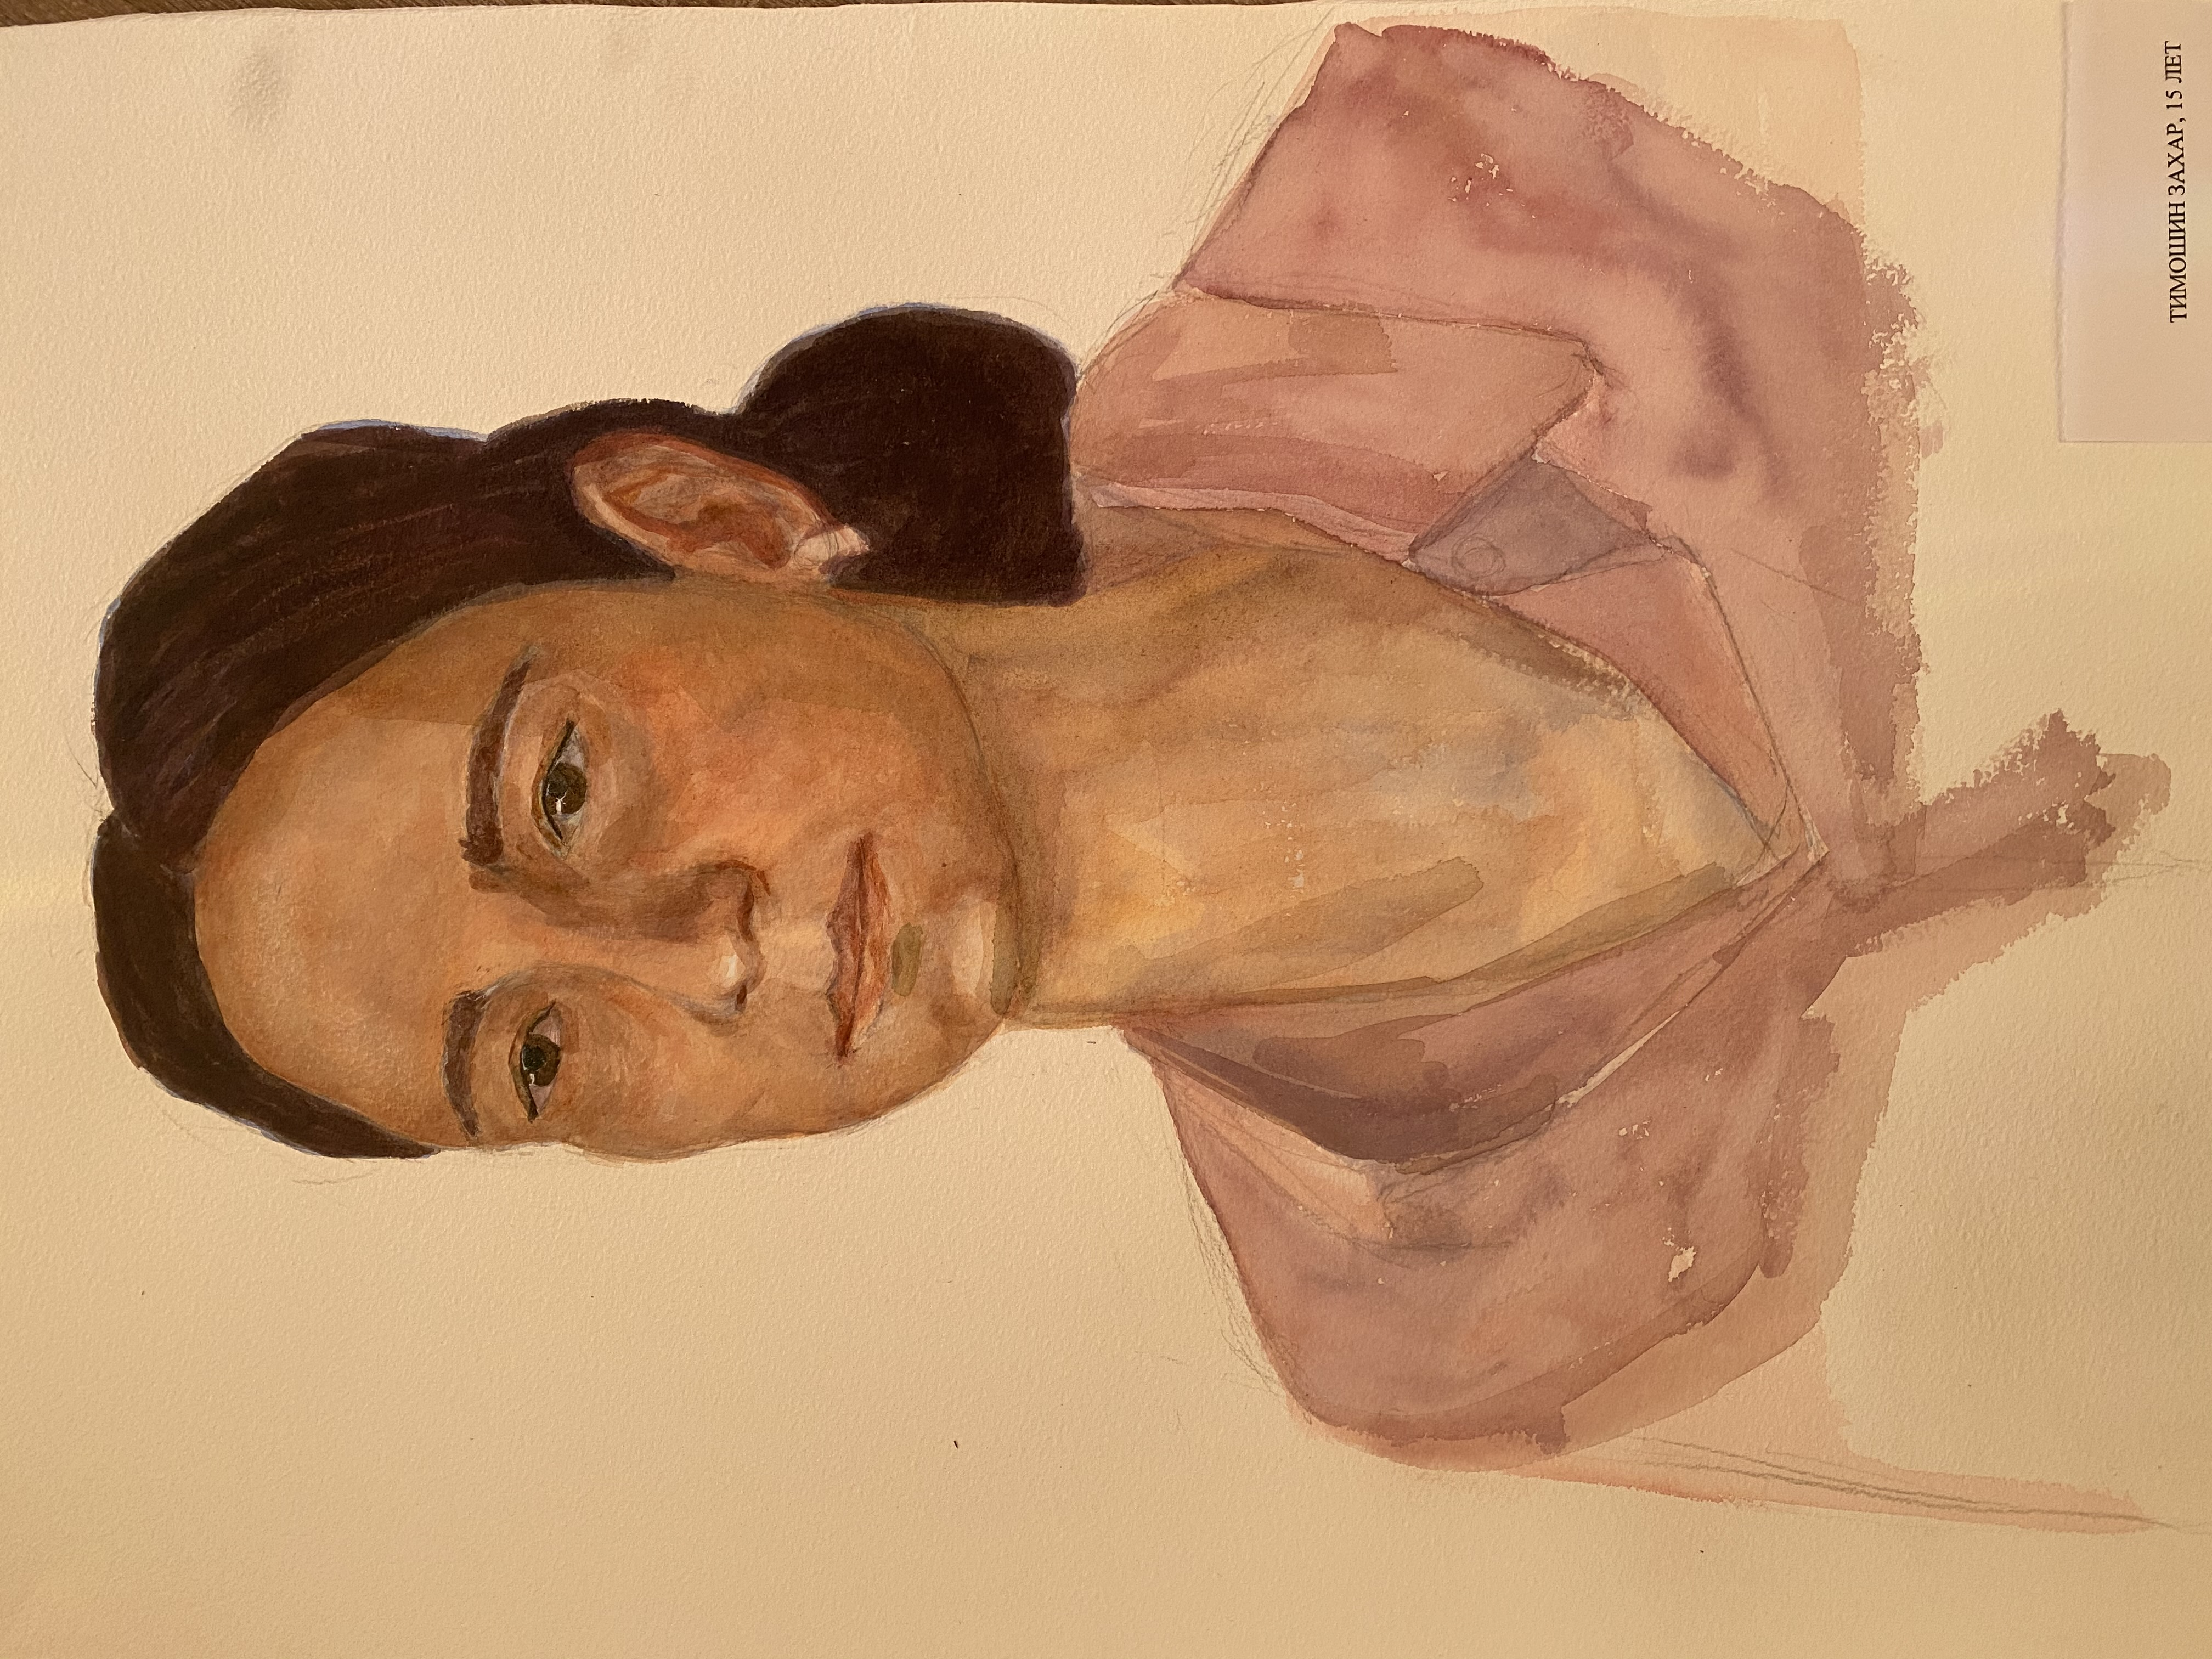 Захар Тимошин, 15 лет